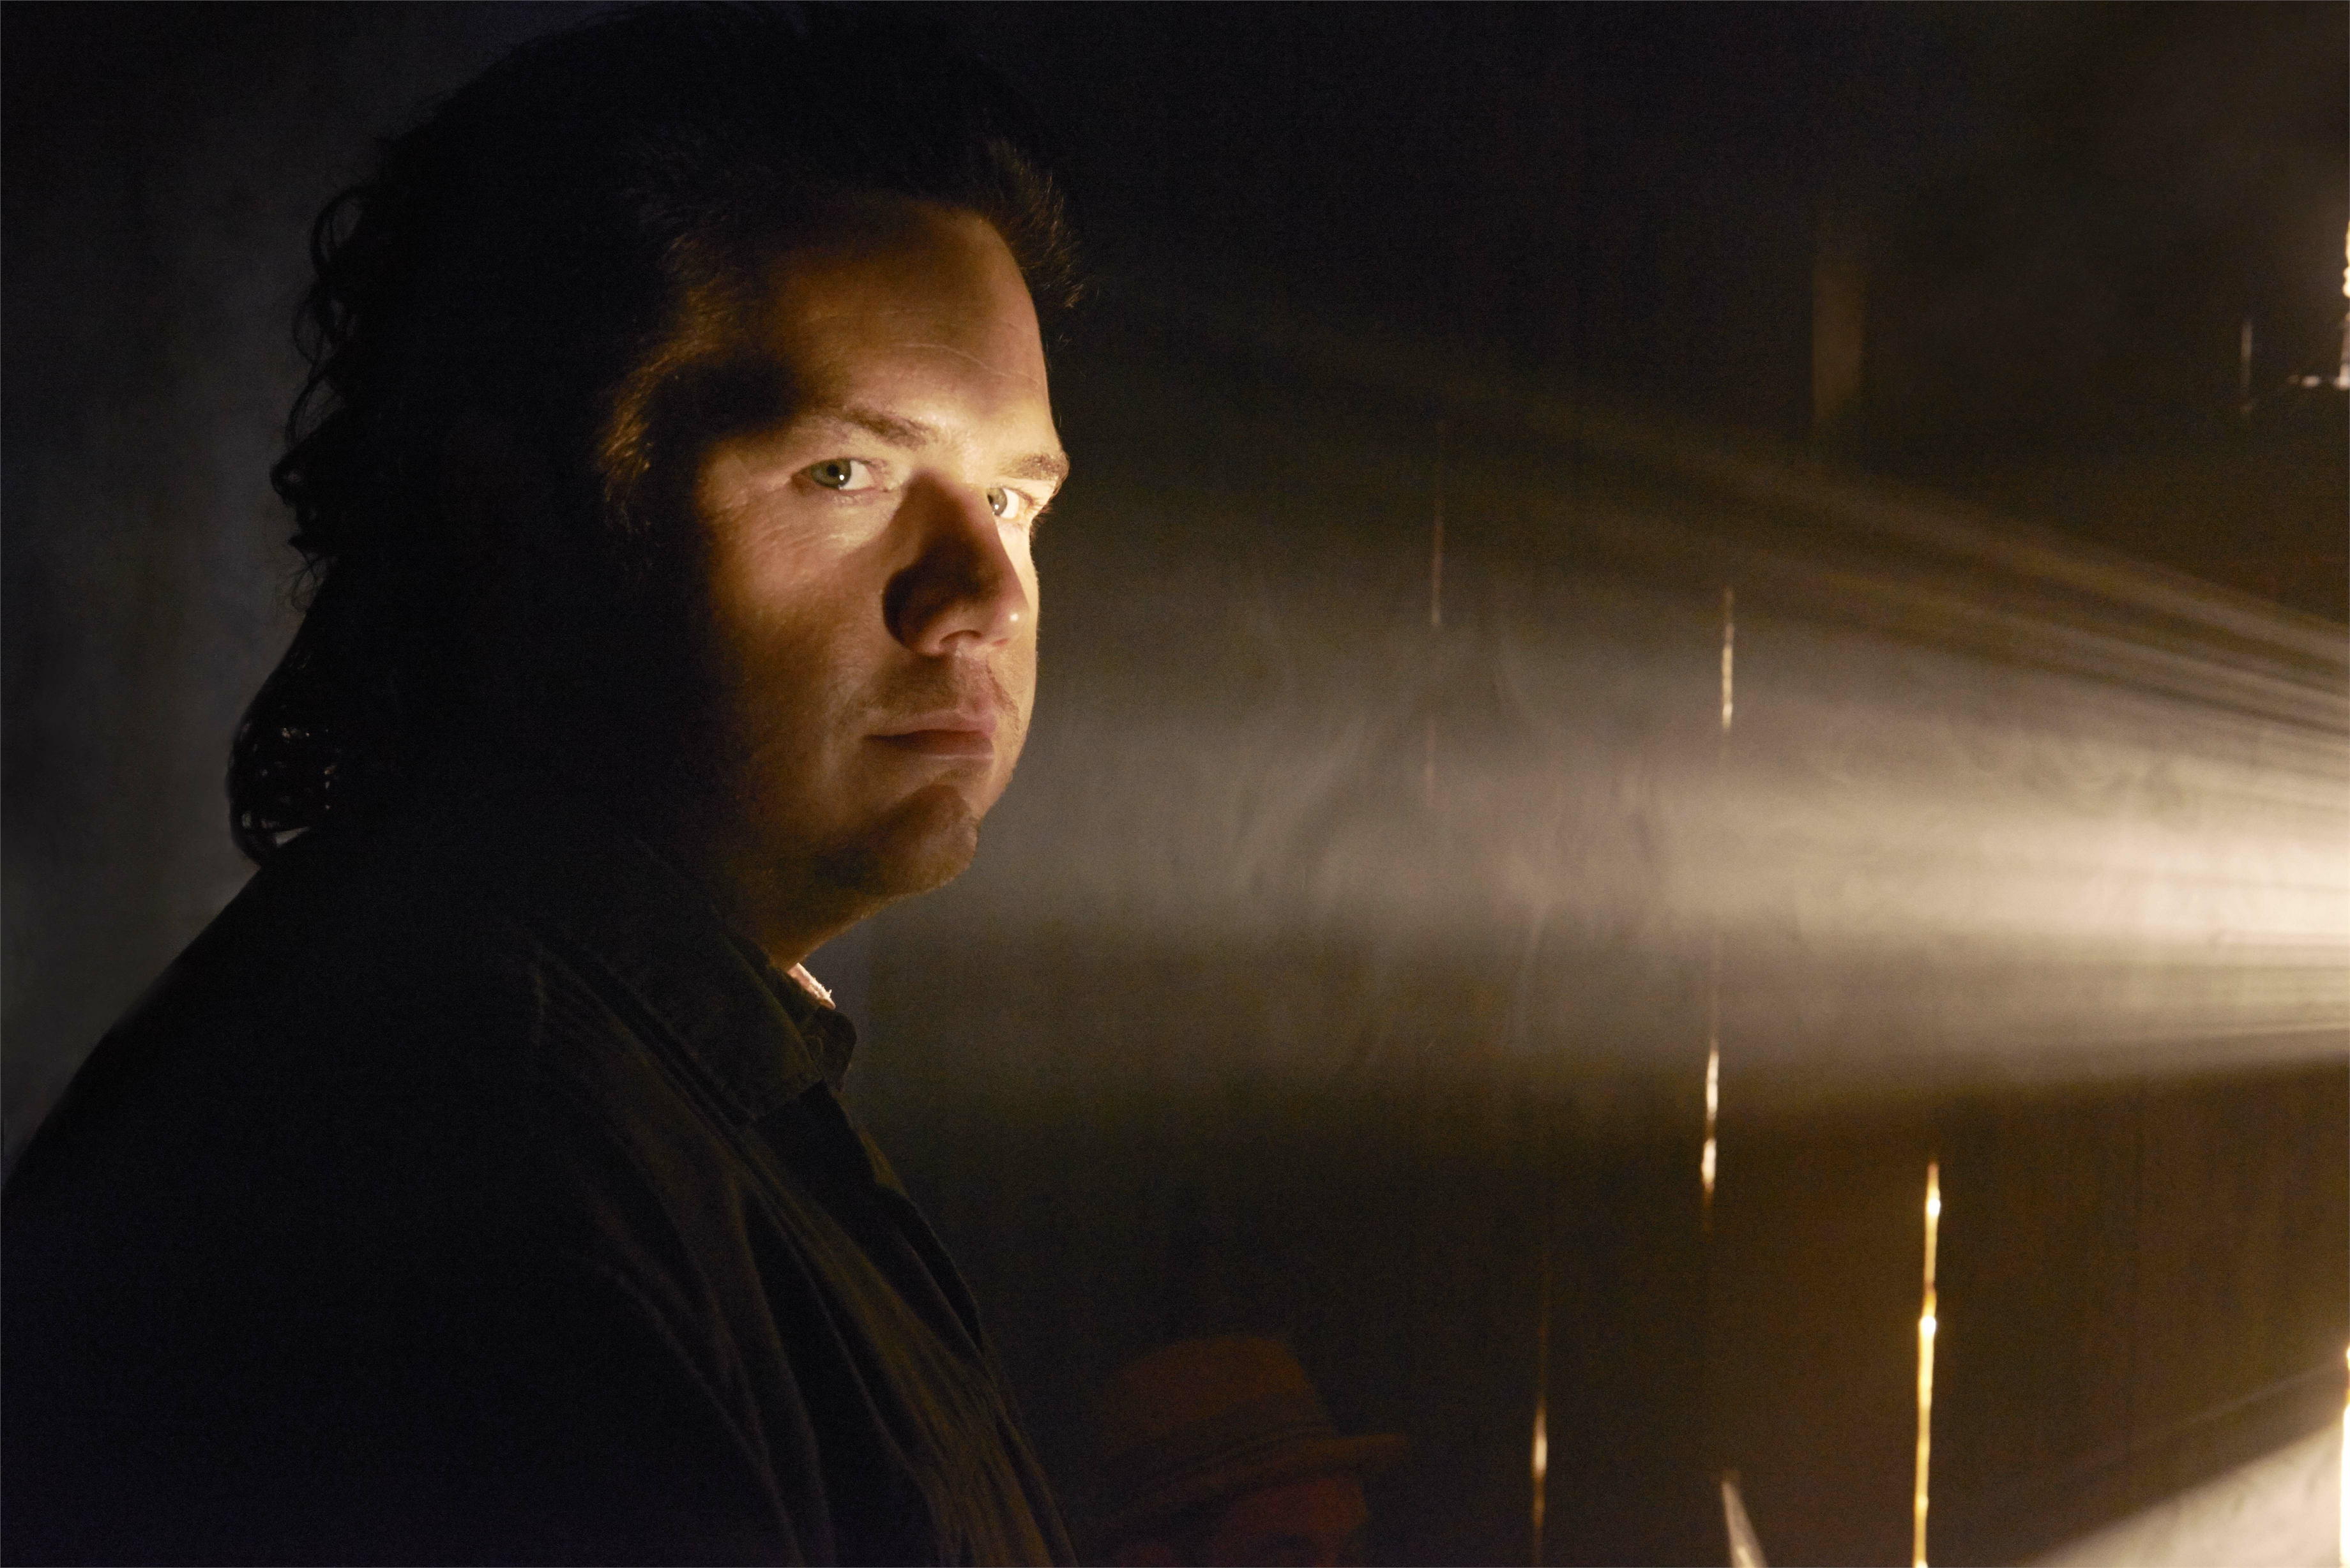 Eugene-Porter-The-Walking-Dead-5-Temporada-Personagens-HQ-007